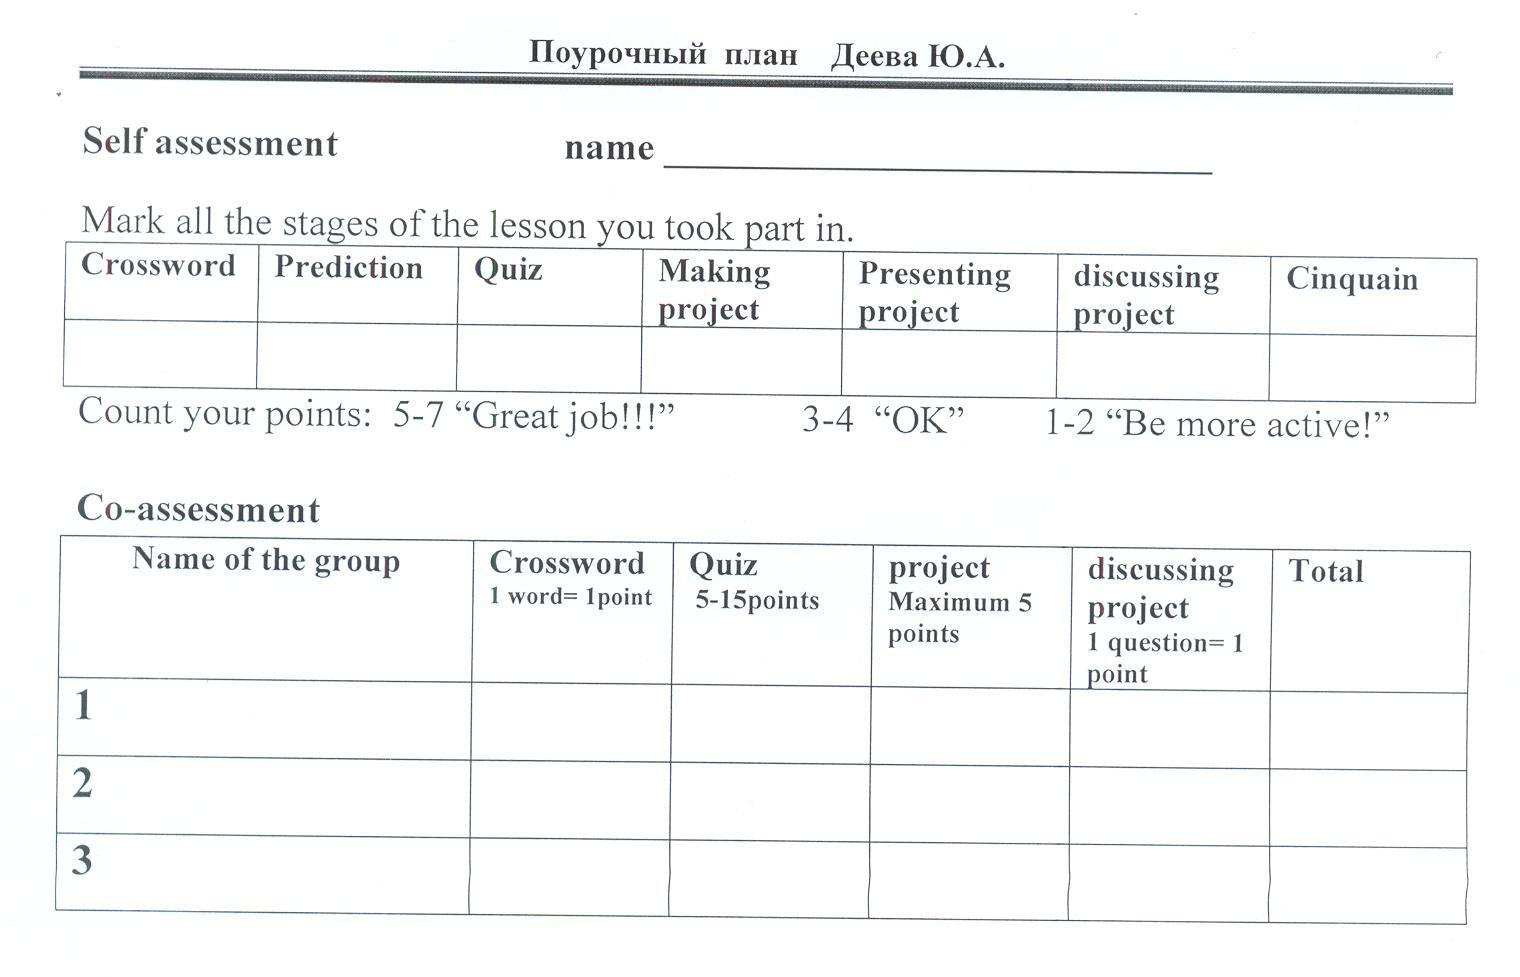 План урока по английскому языку 8 класс на тему наурыз